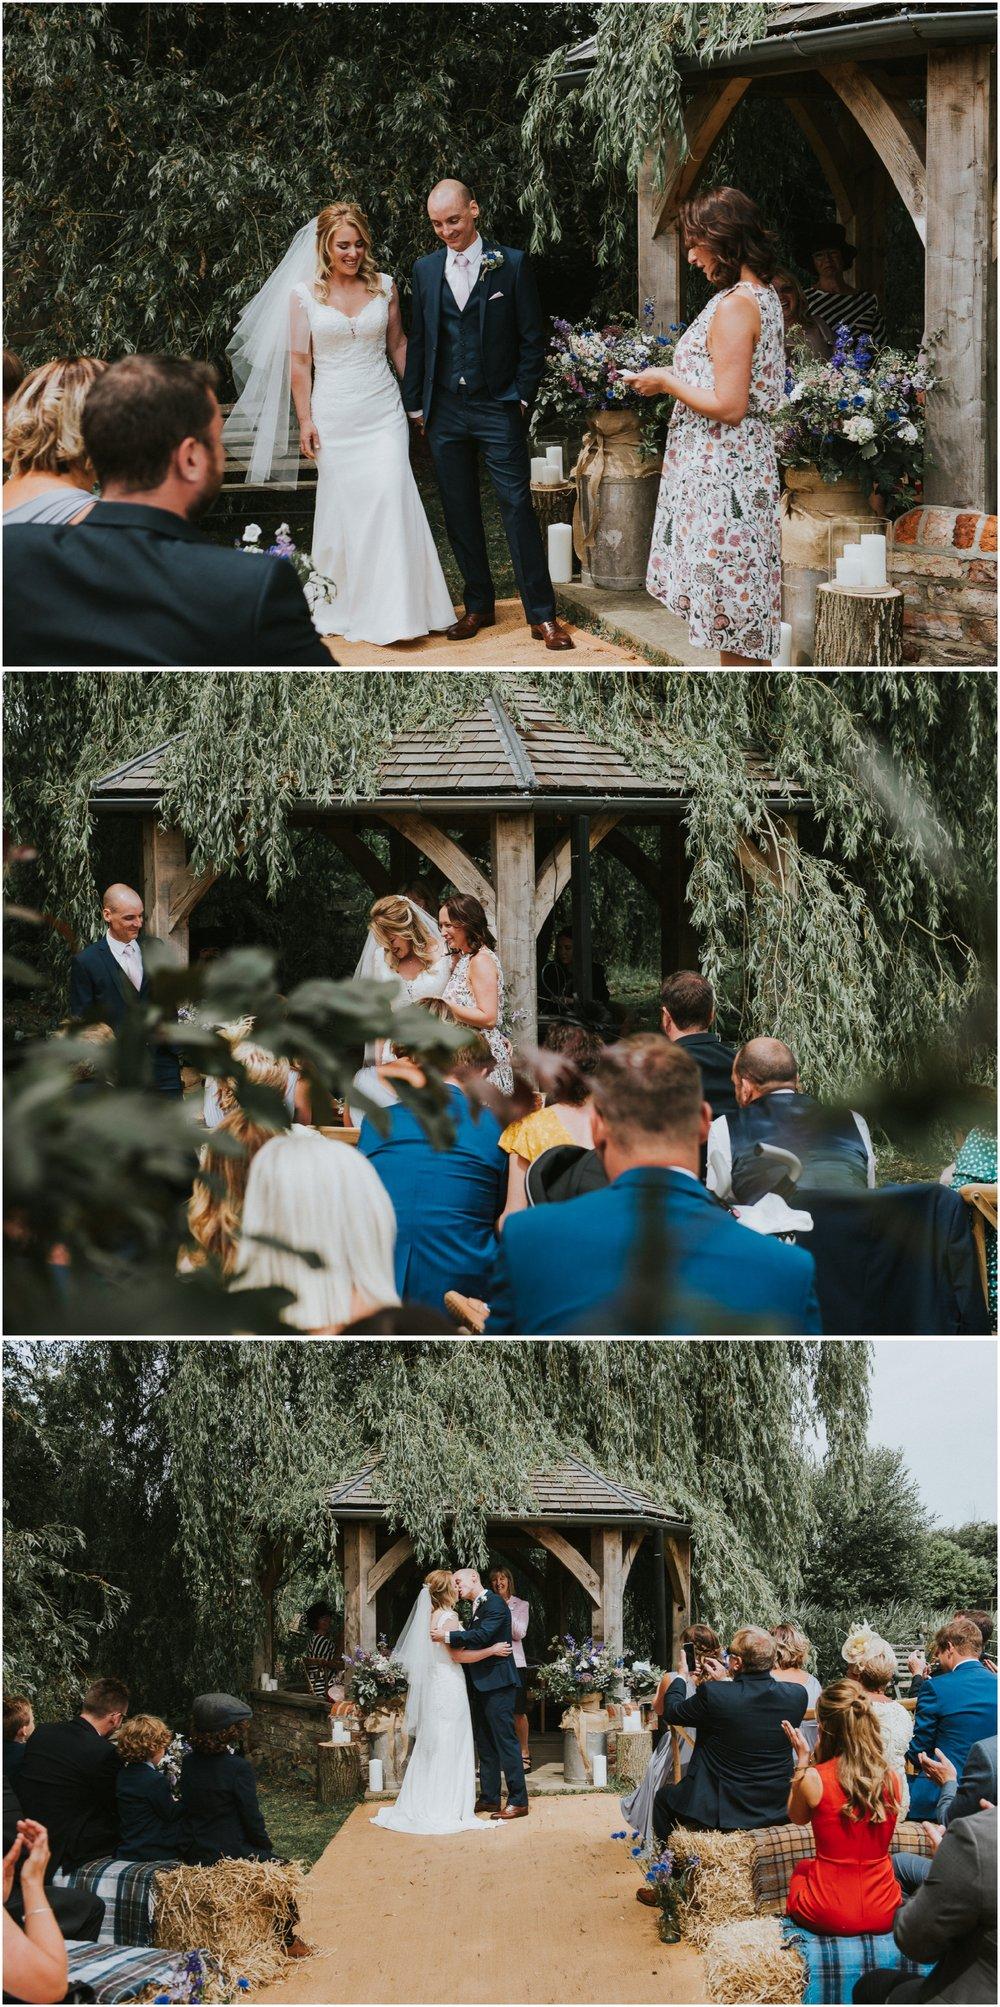 SkipbridegFarmWedding-LukeHolroyd-Yorkshirewedding_0037.jpg